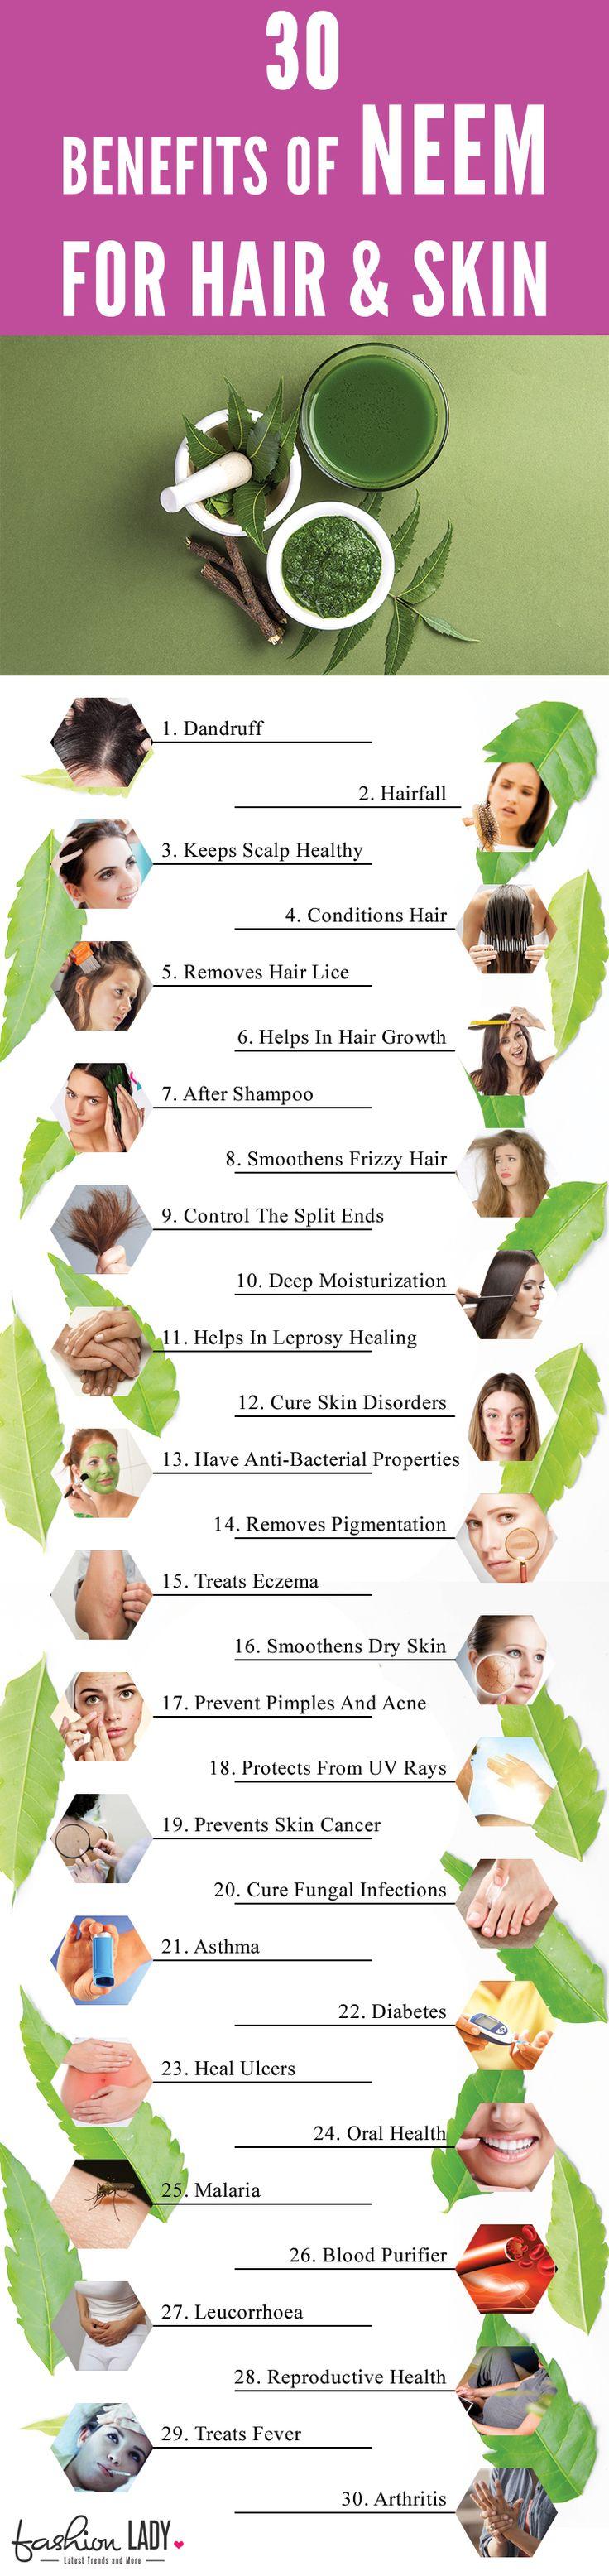 30 Benefits Of Neem for Hair & Skin